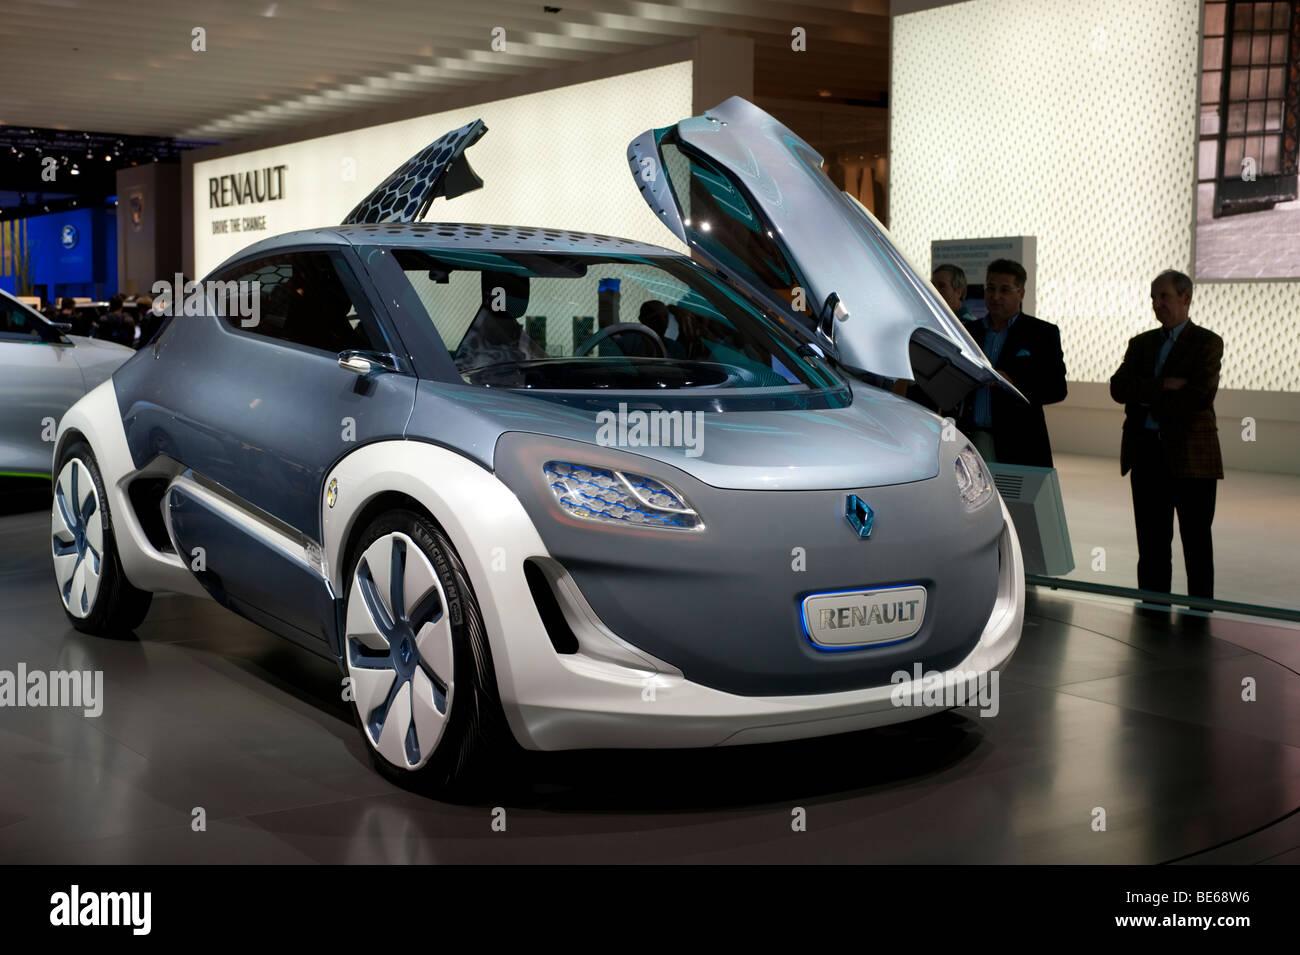 100 Renault Motor Renault Reveals Lightweight Two